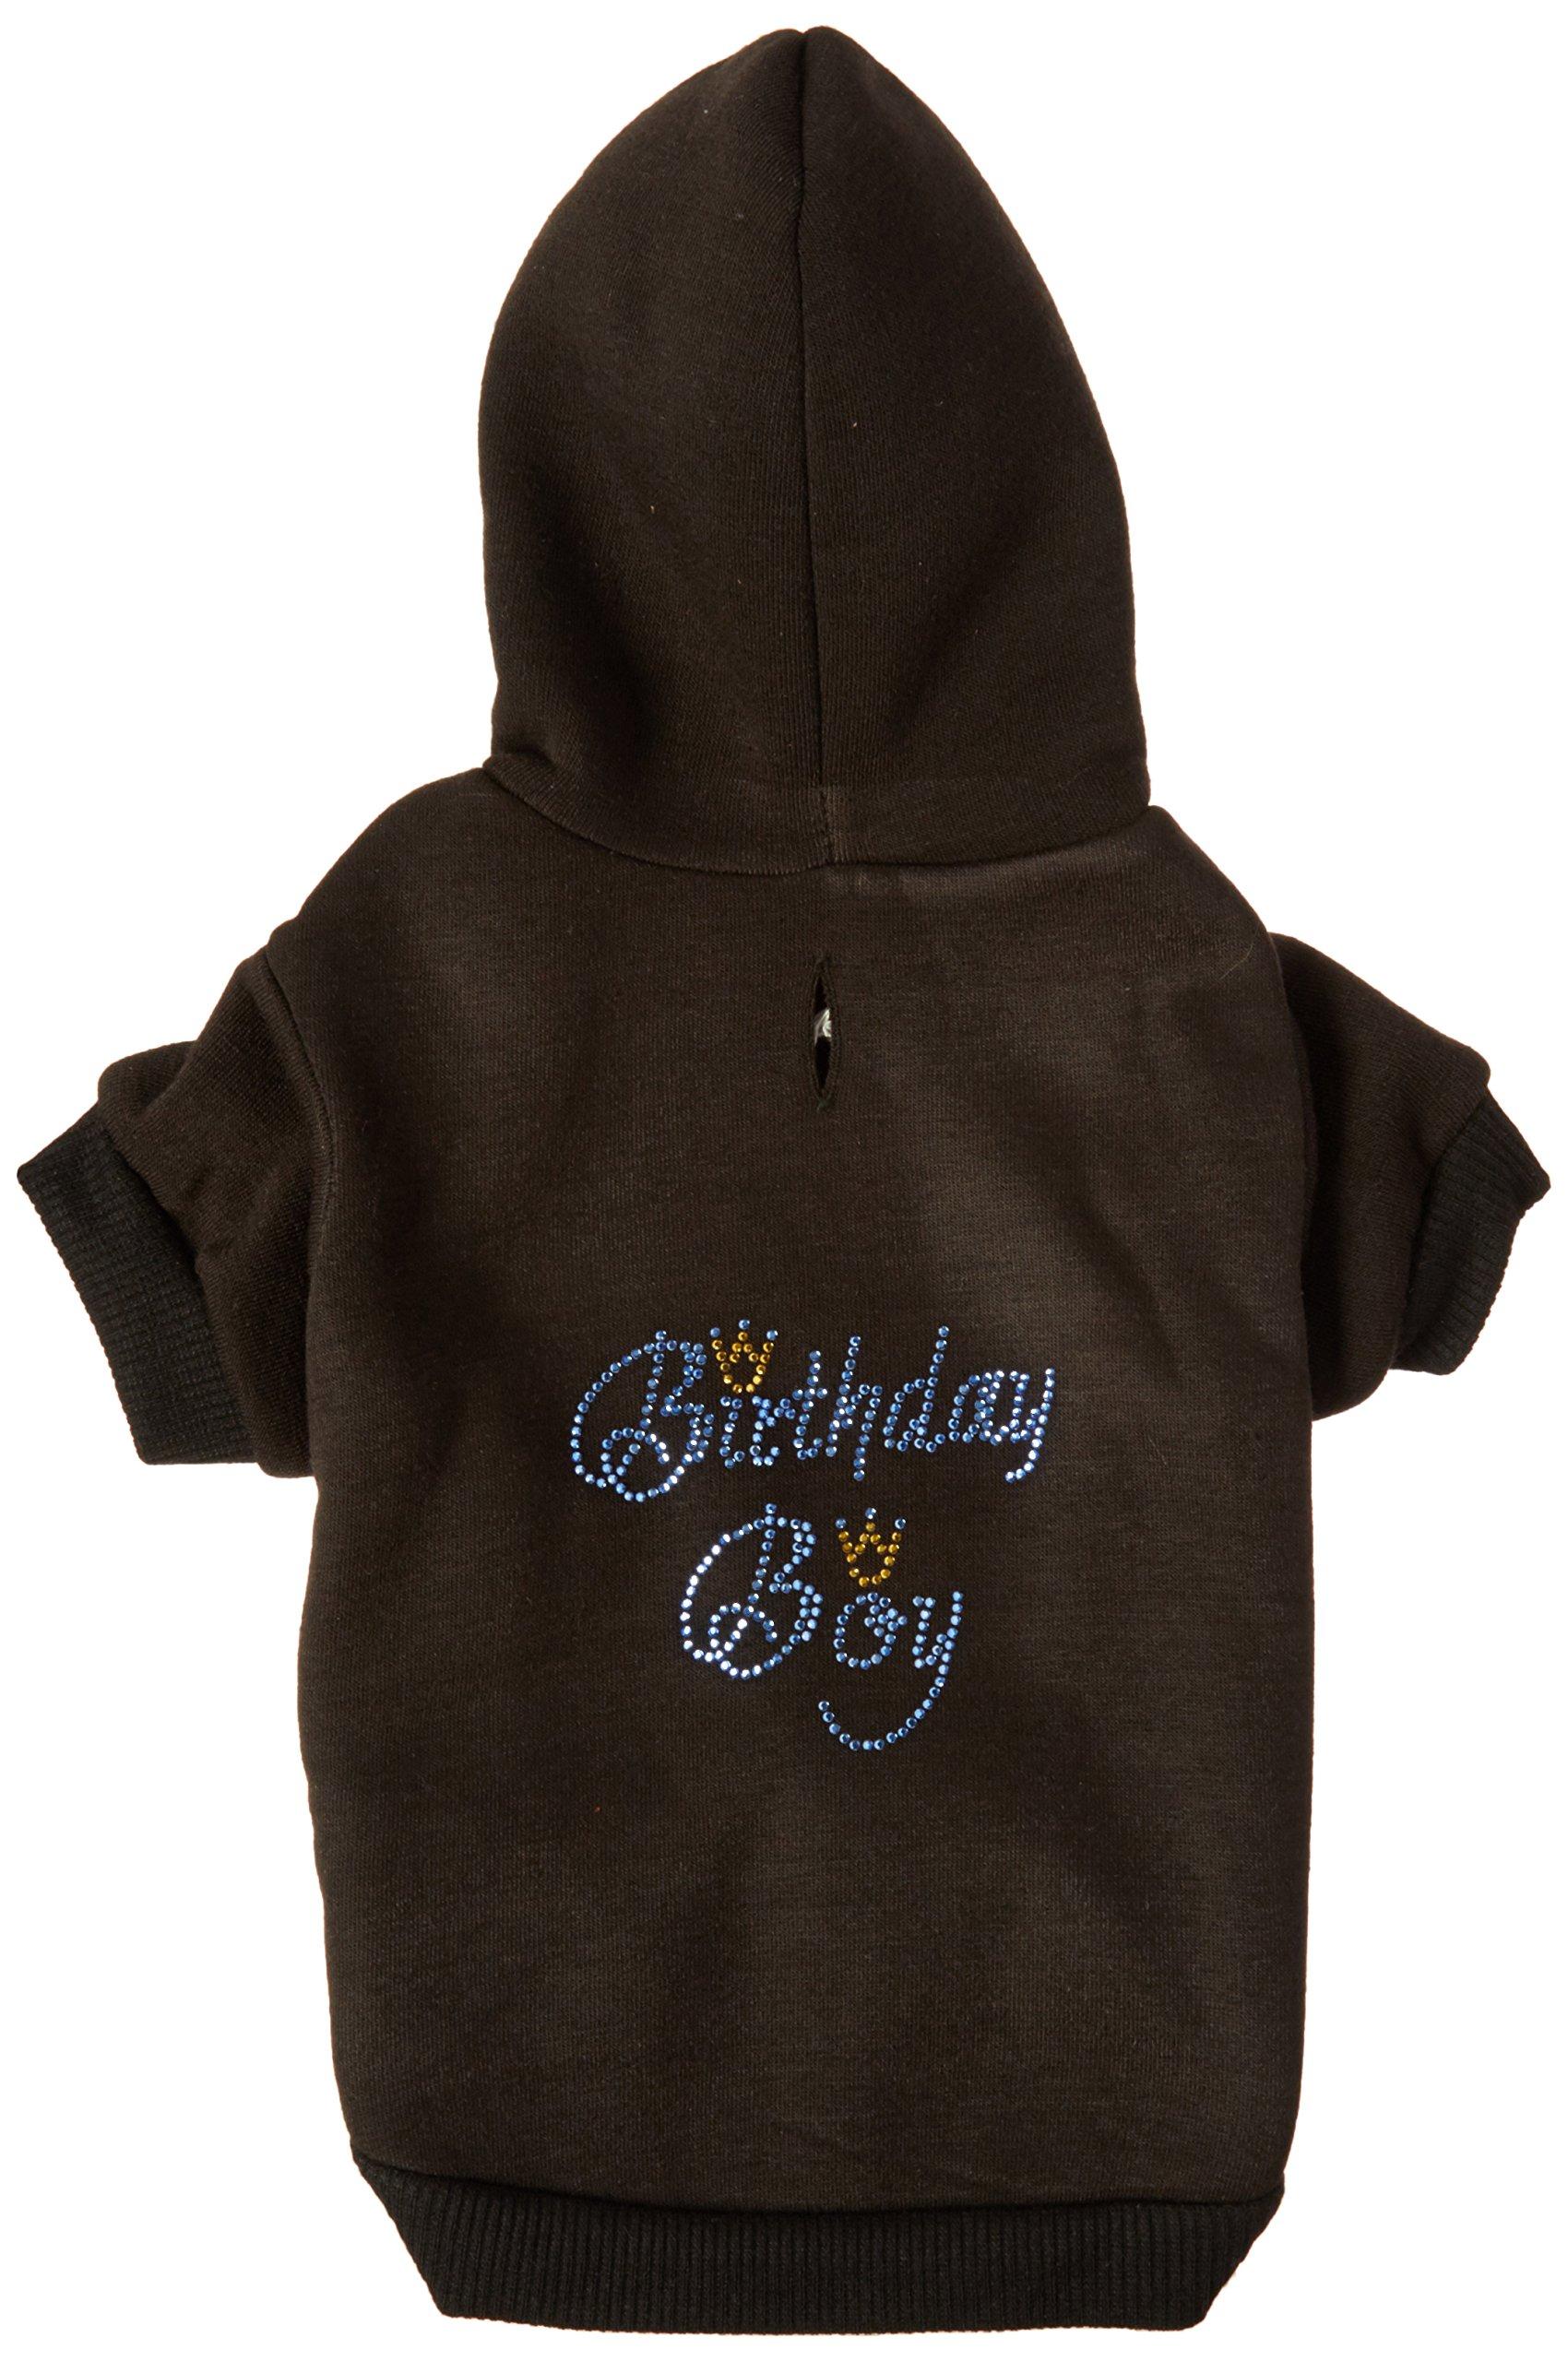 Mirage Pet Products 12-Inch Birthday Boy Hoodies, Medium, Black